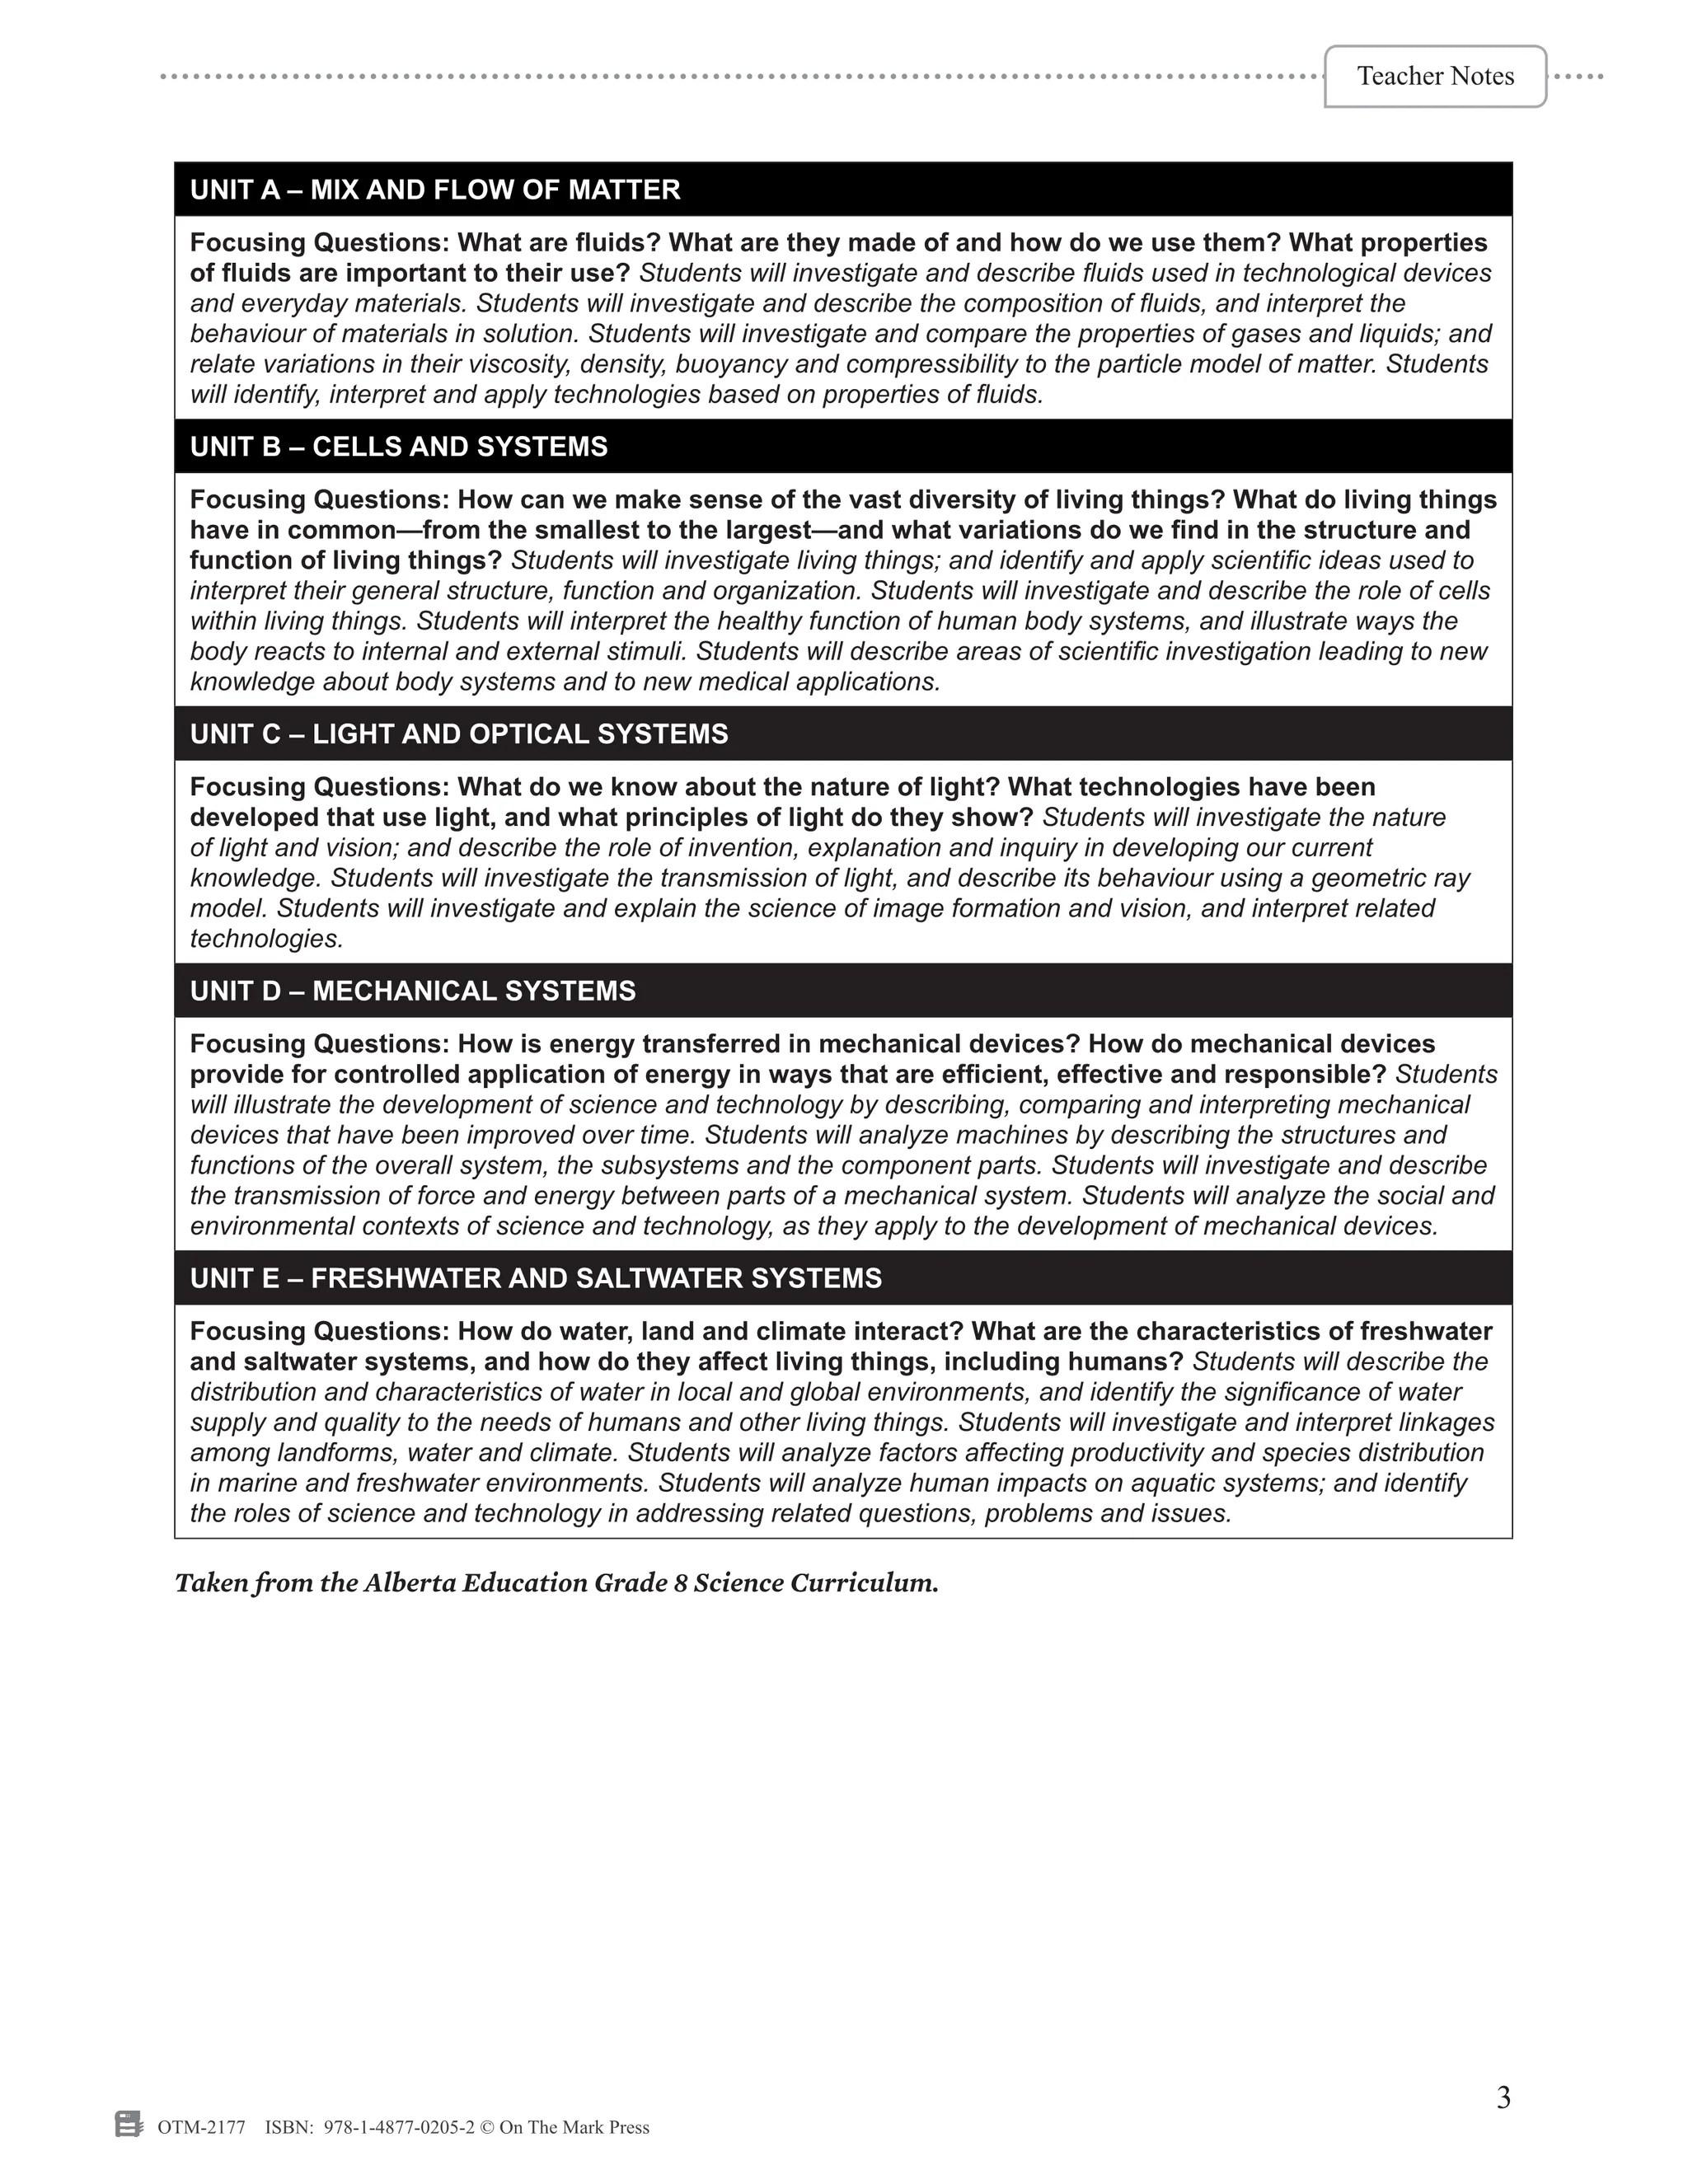 medium resolution of Alberta Grade 8 Science Curriculum - On The Mark Press